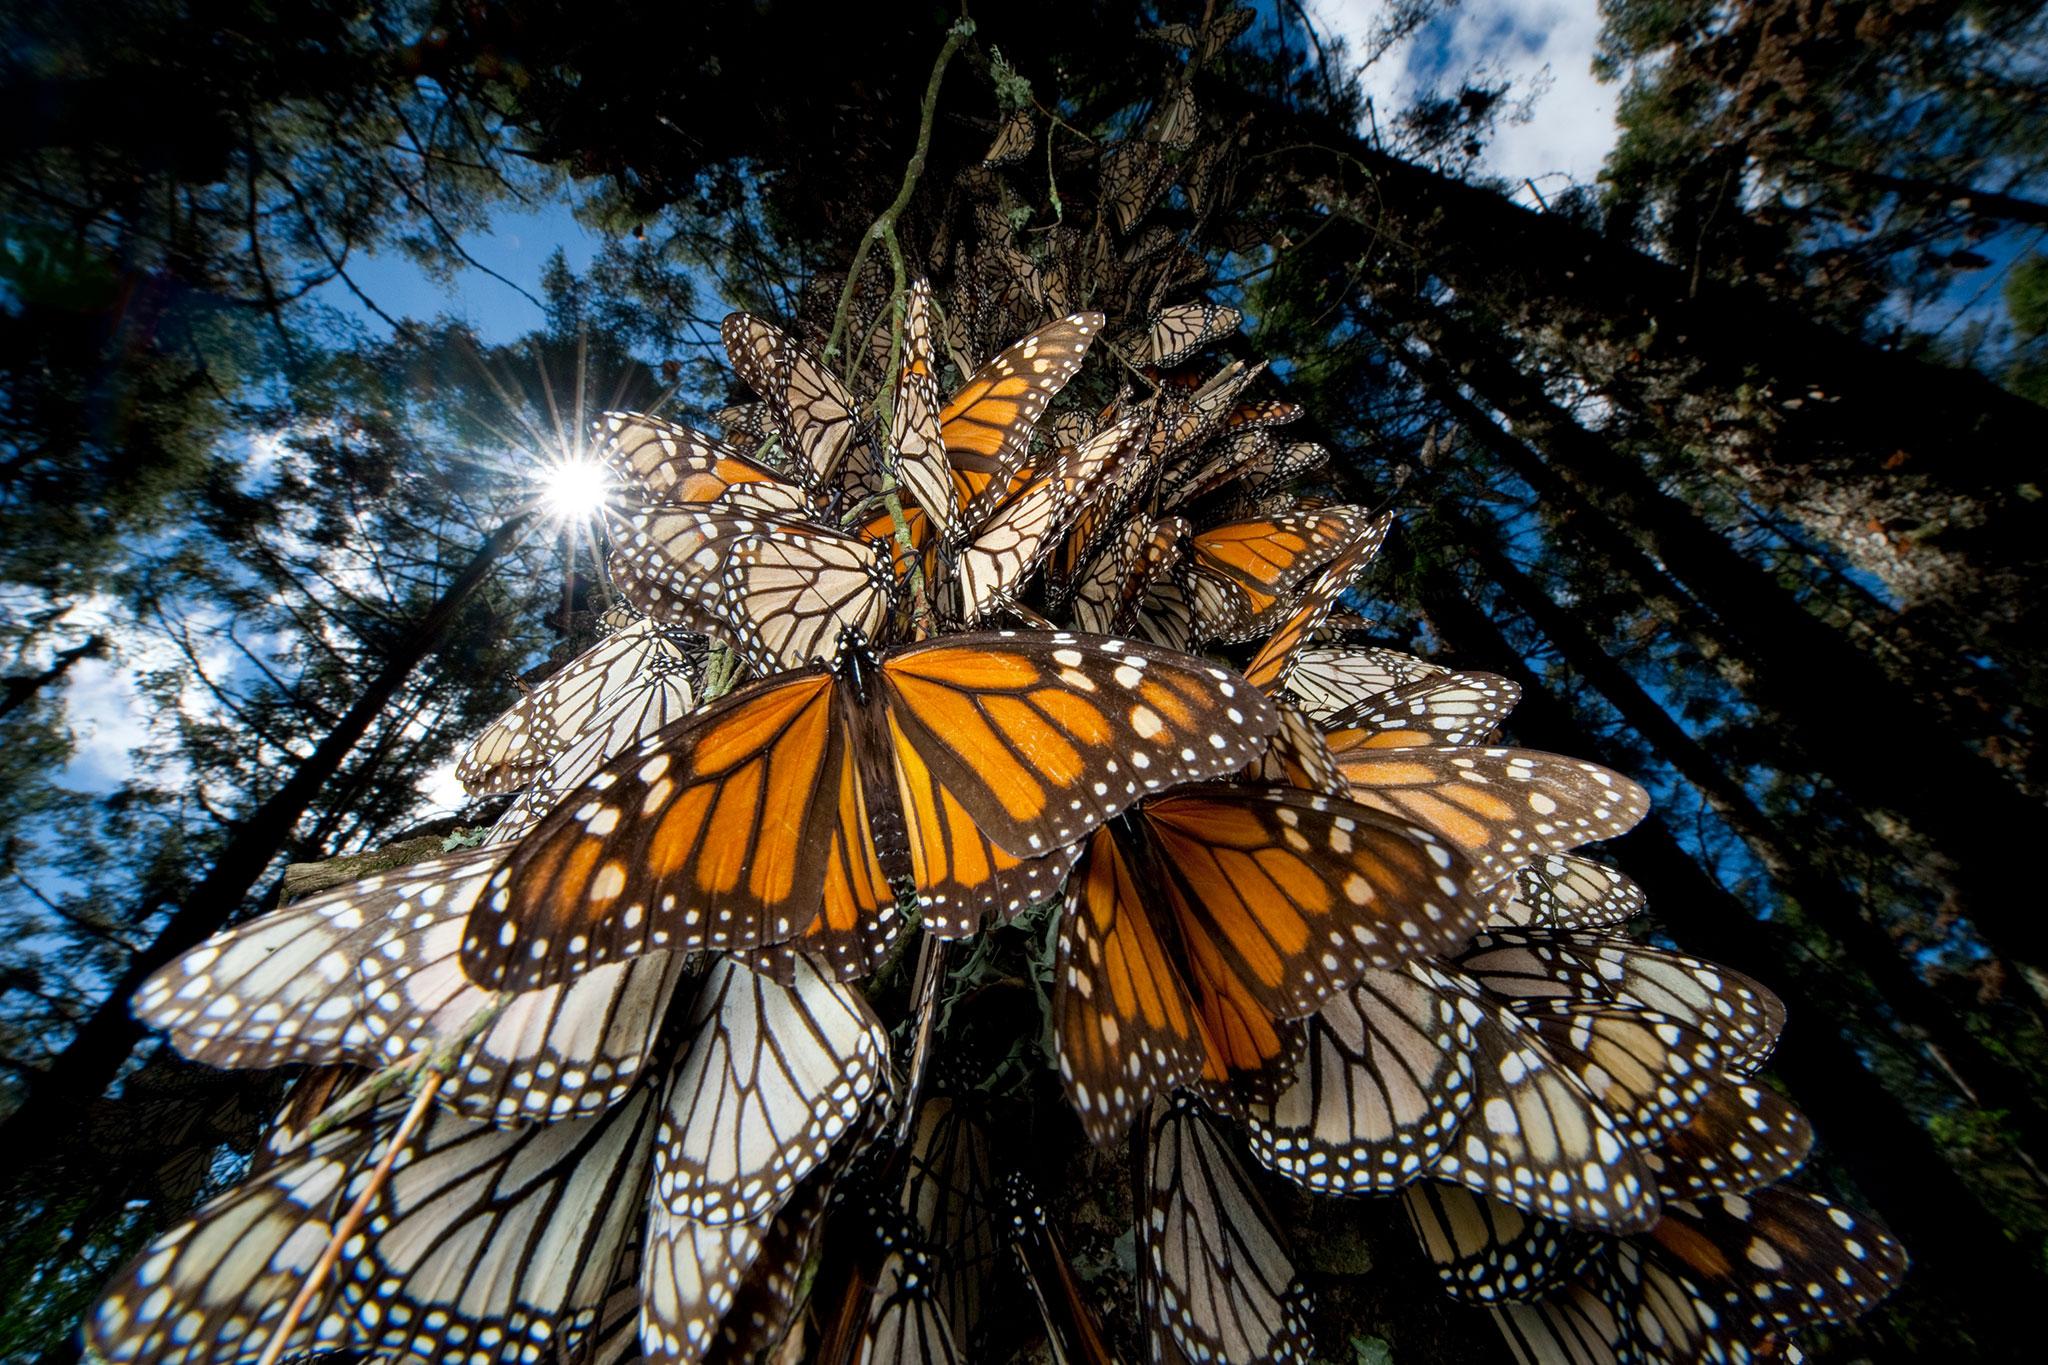 01-monarchs-NationalGeographic_1353541.jpg